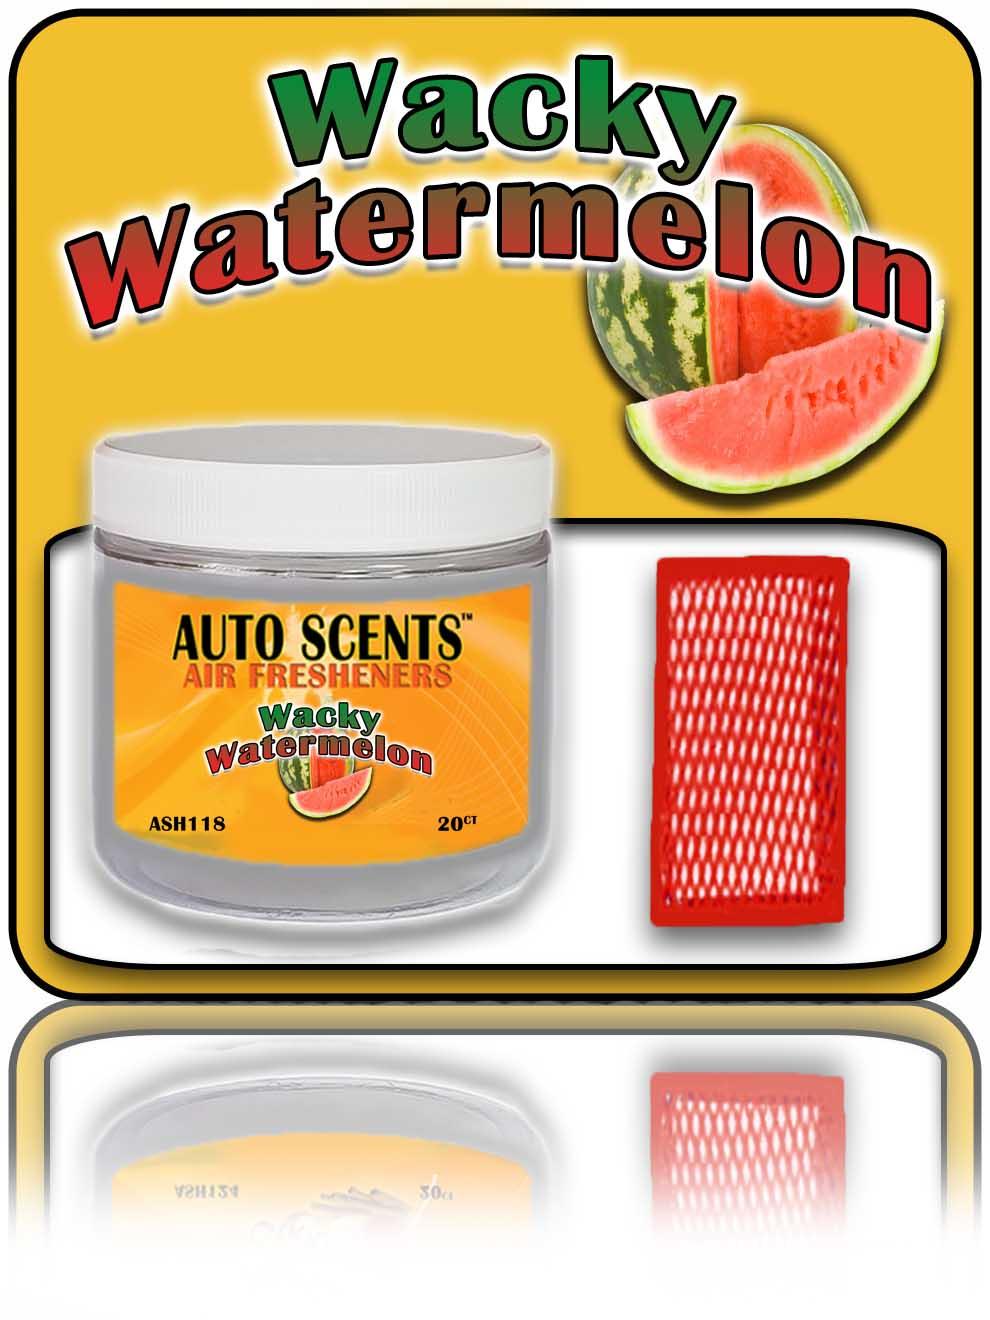 Car Dealerships In Albuquerque >> Wacky Watermelon Air Freshener 20-Count